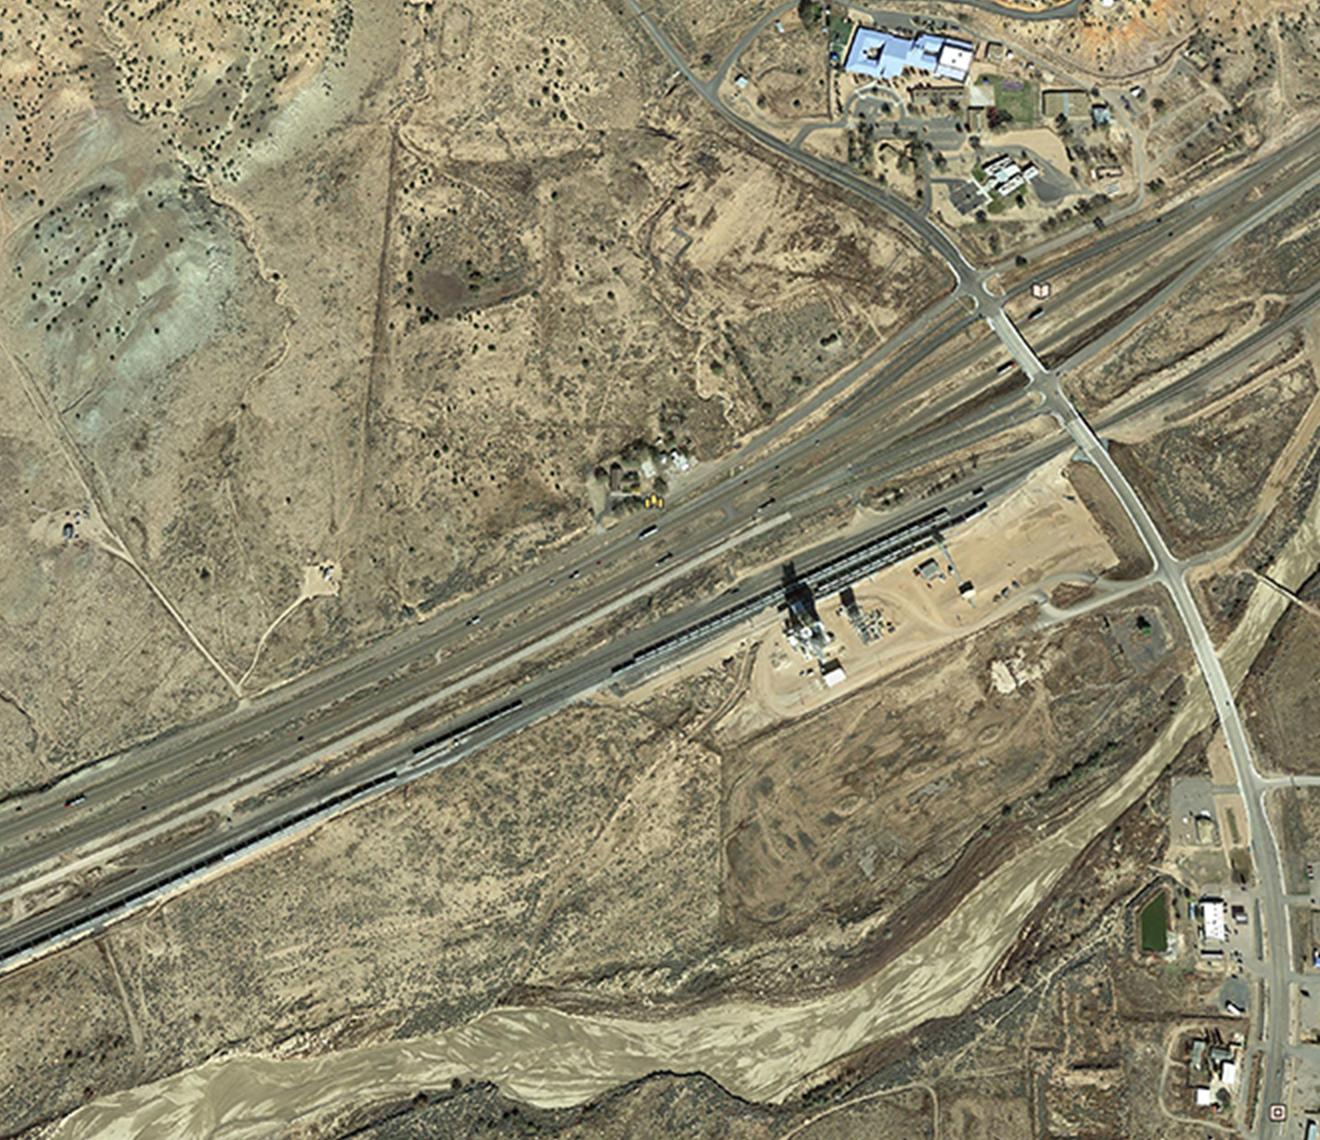 >500 rail car capacity at our rail load-out terminal.